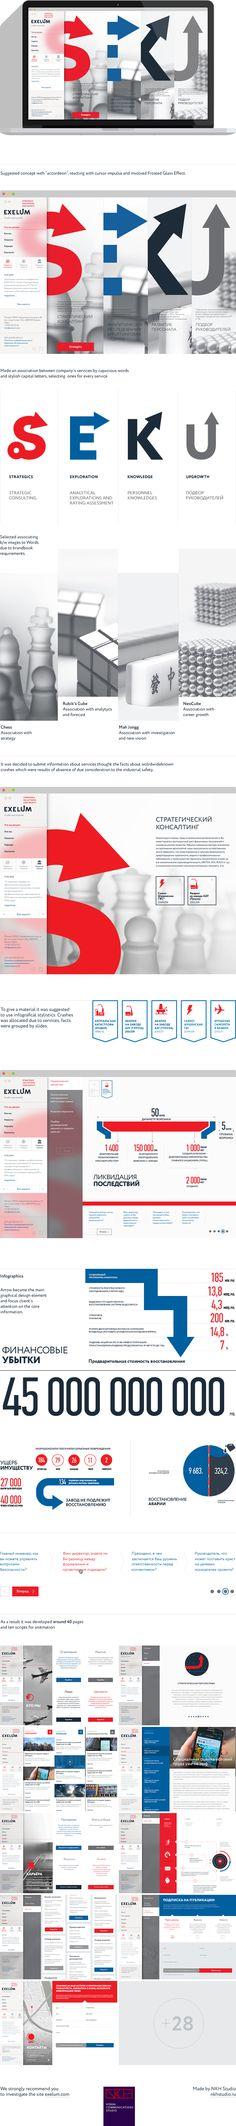 EXELUM by Nazir Khasavov, #web #webdesign #website